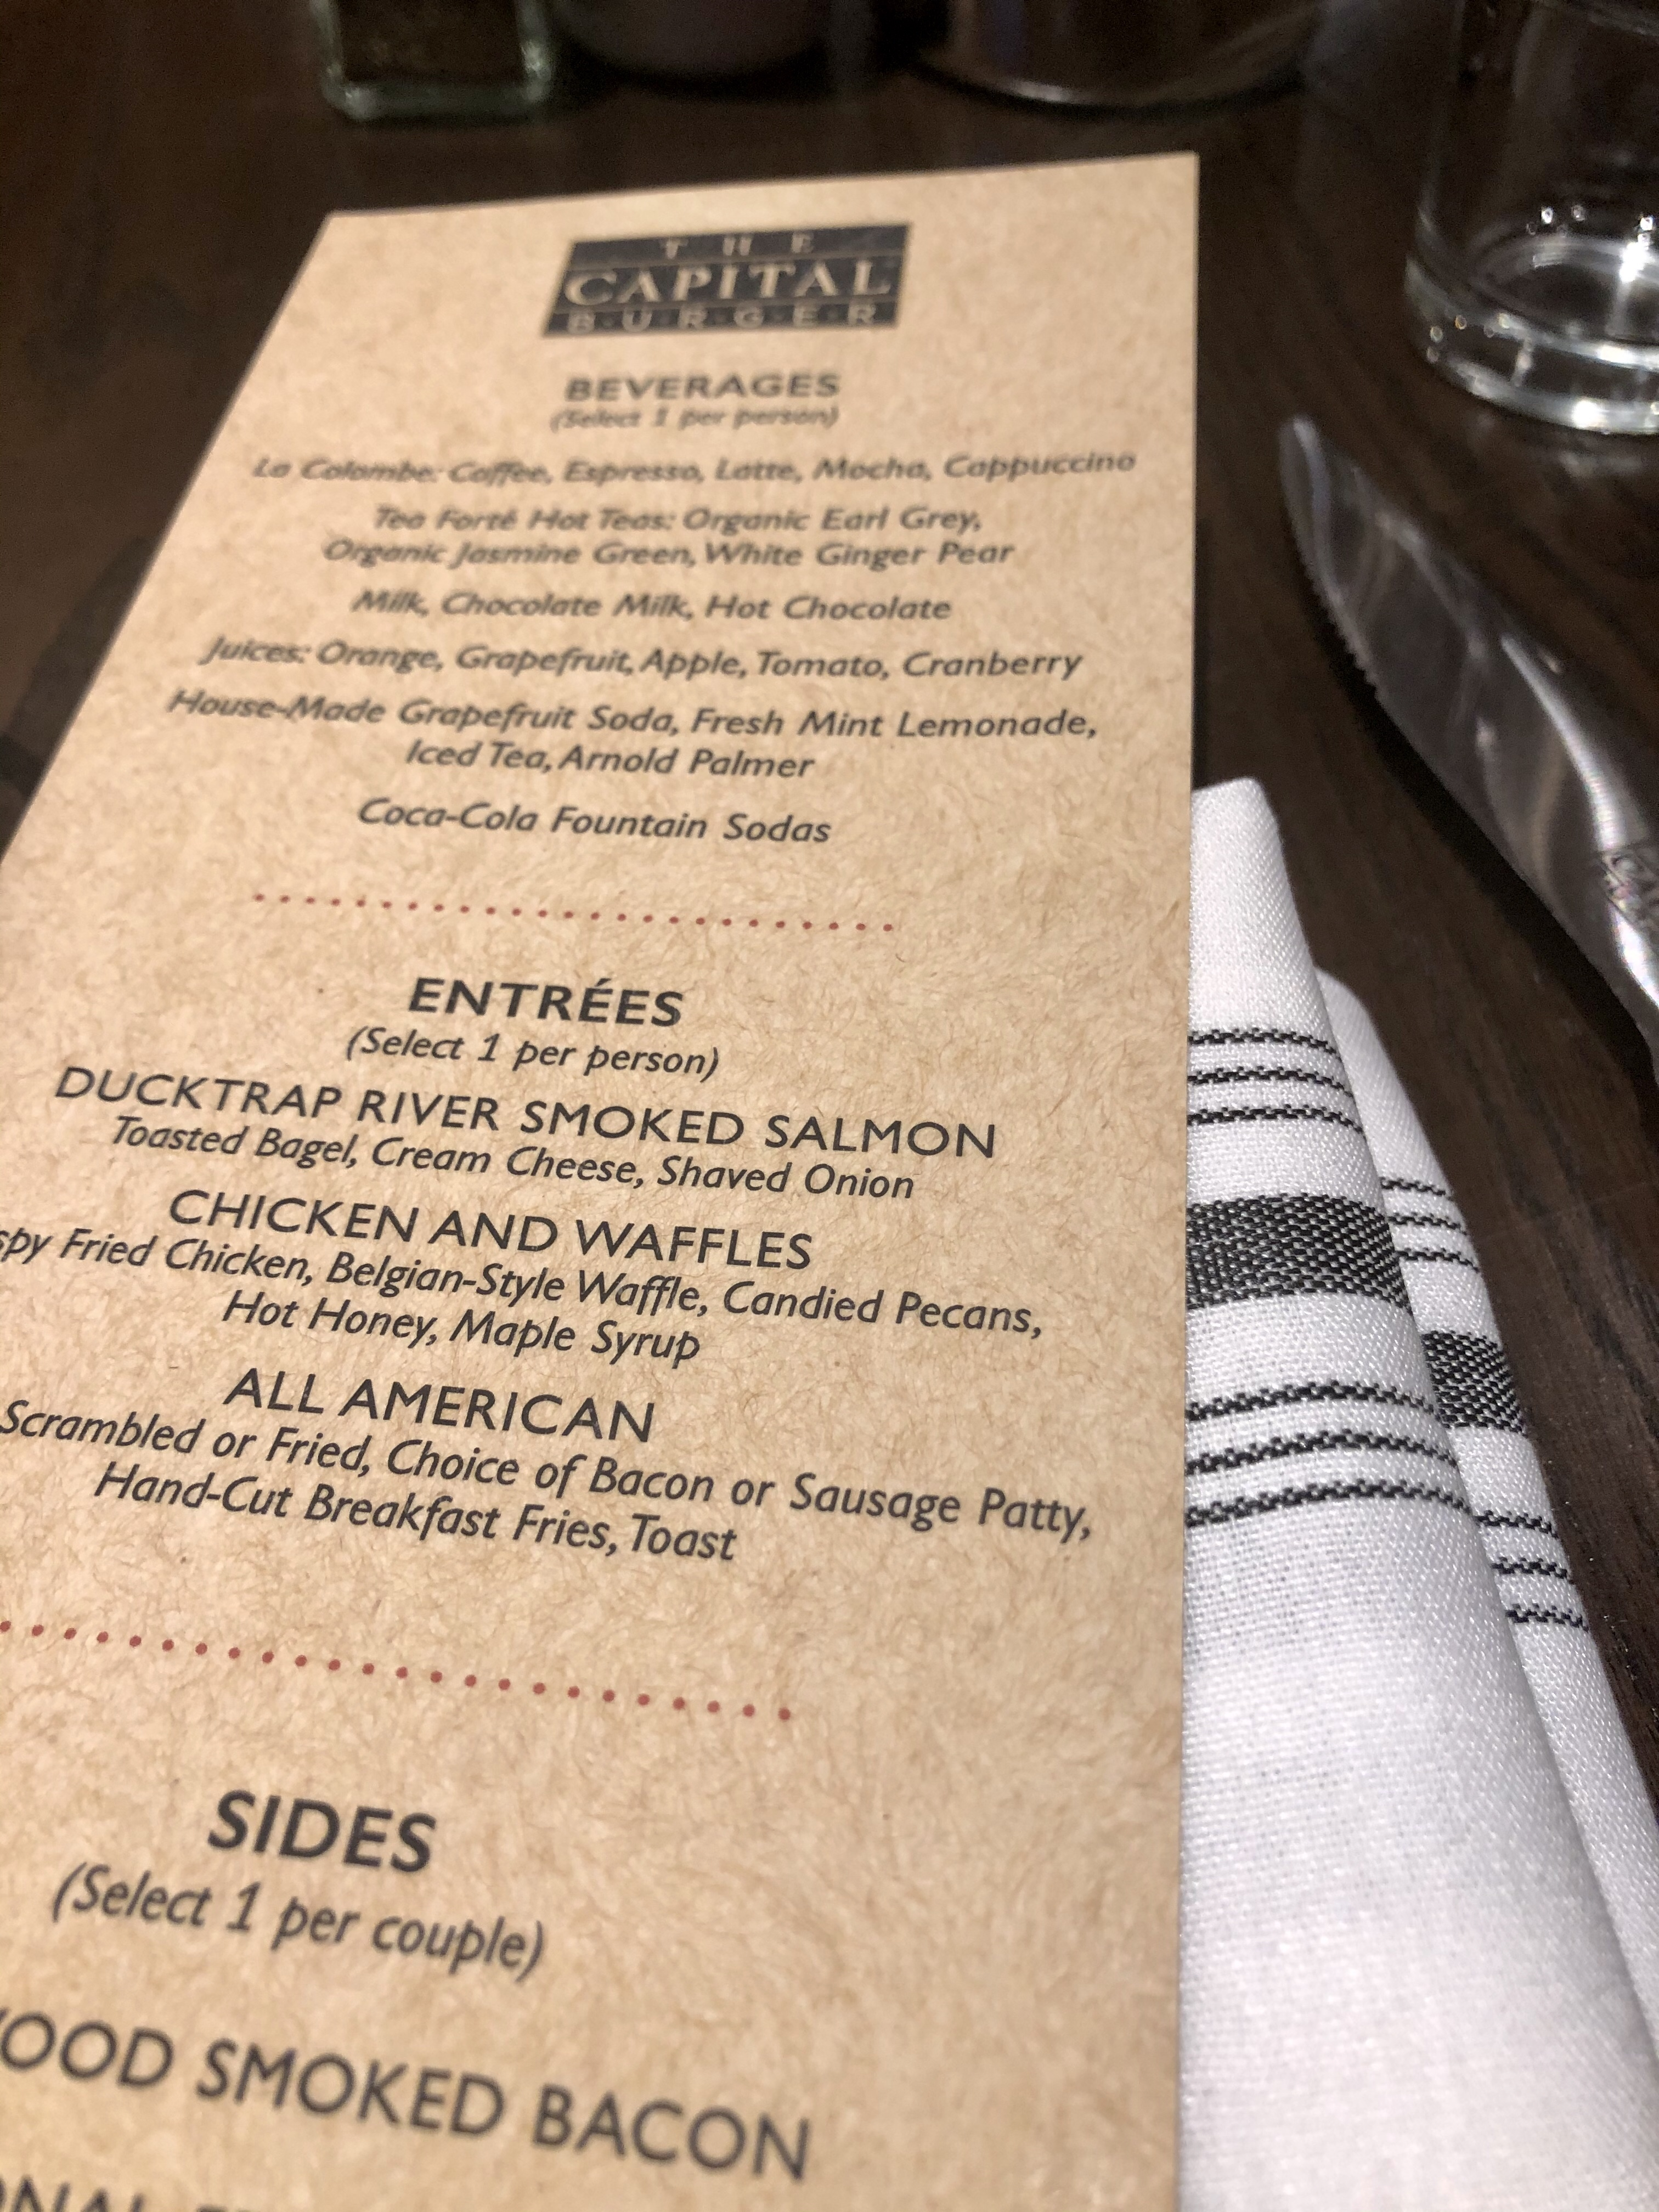 A restaurant menu on a table.